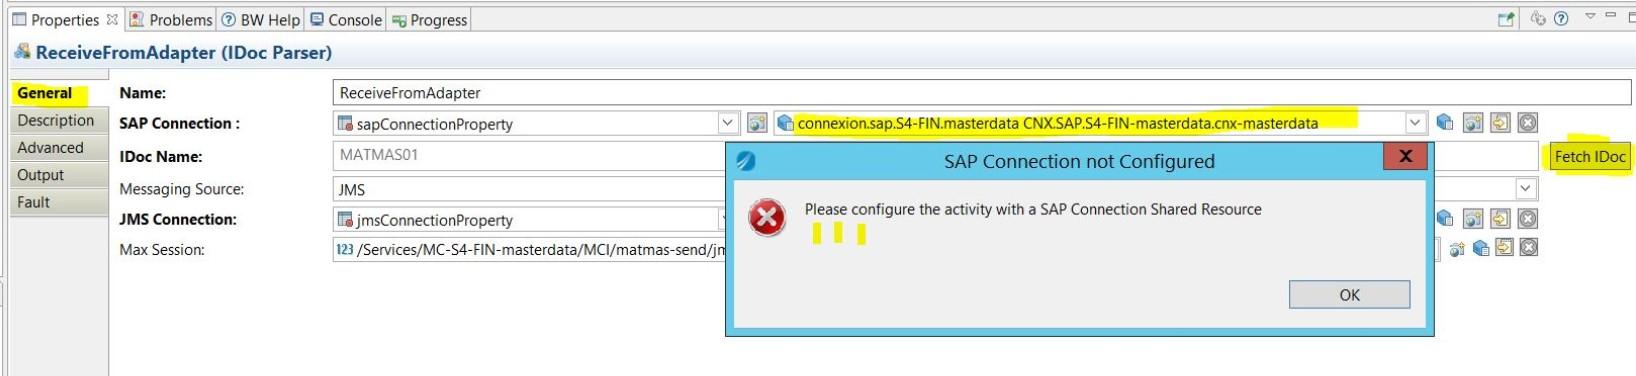 IDOC schema FETCH button on SAP Plugin activity doesn't work